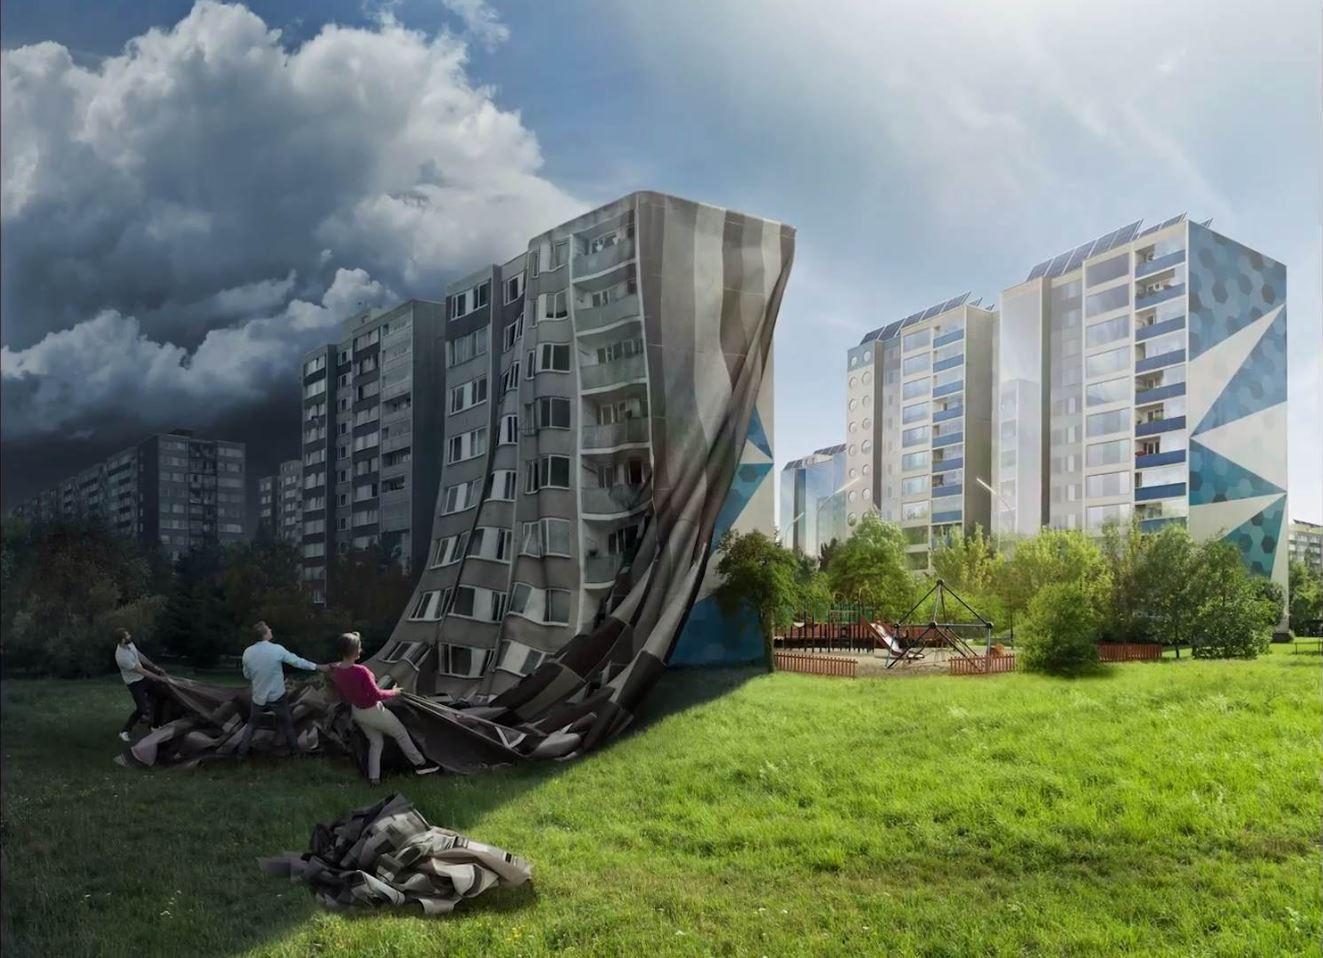 Imagenes surrealistas - Página 3 Beyond%2BConstruction%2BErik%2BJohansson